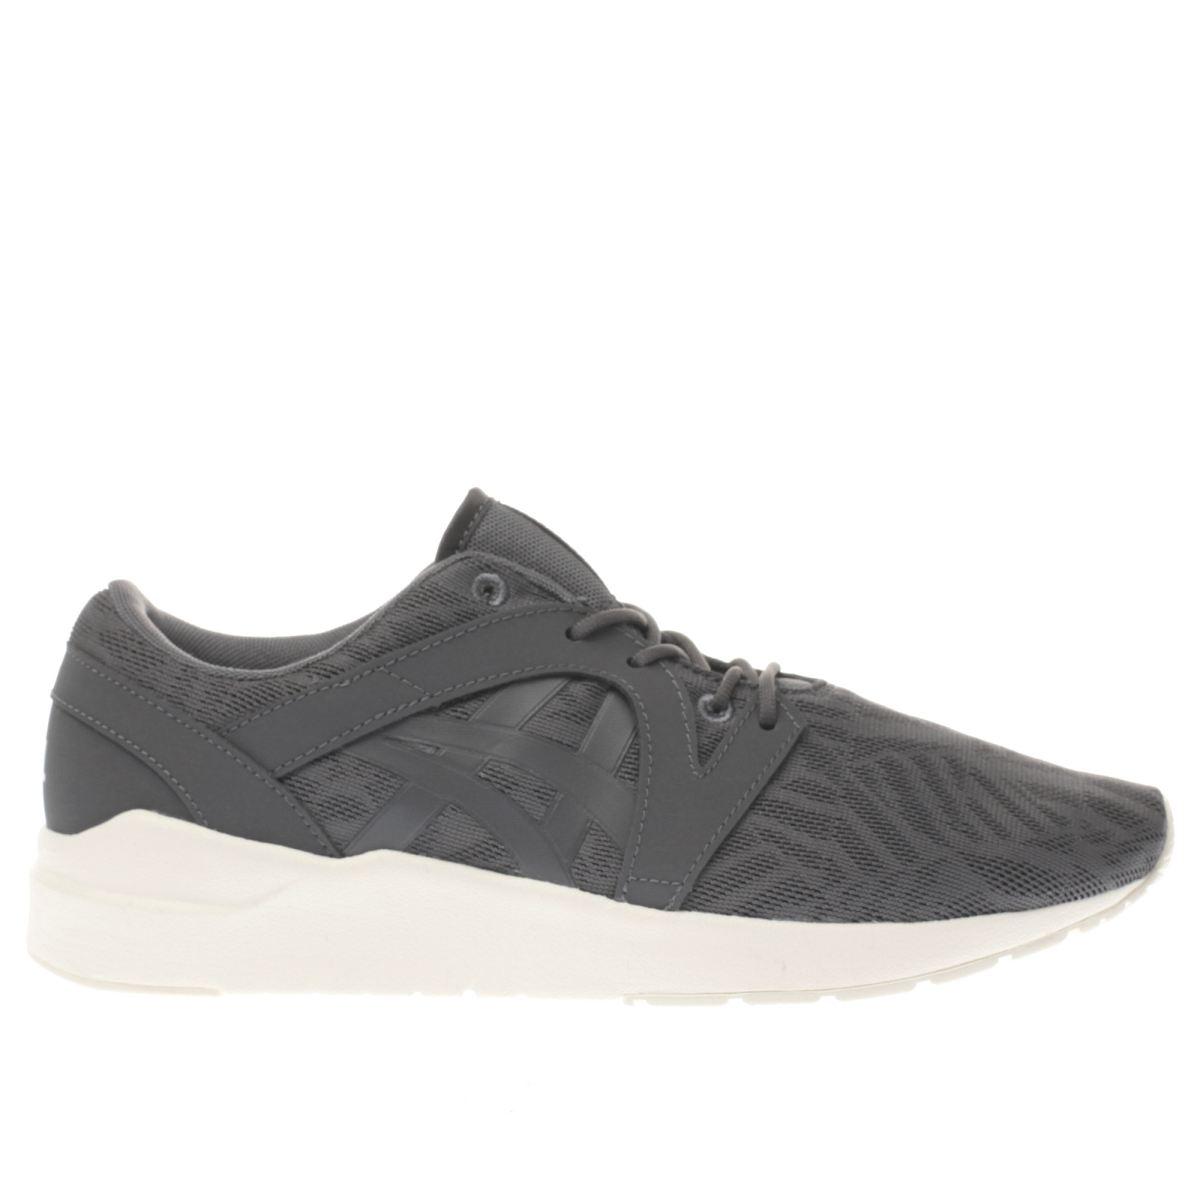 asics dark grey gel-lyte komachi trainers